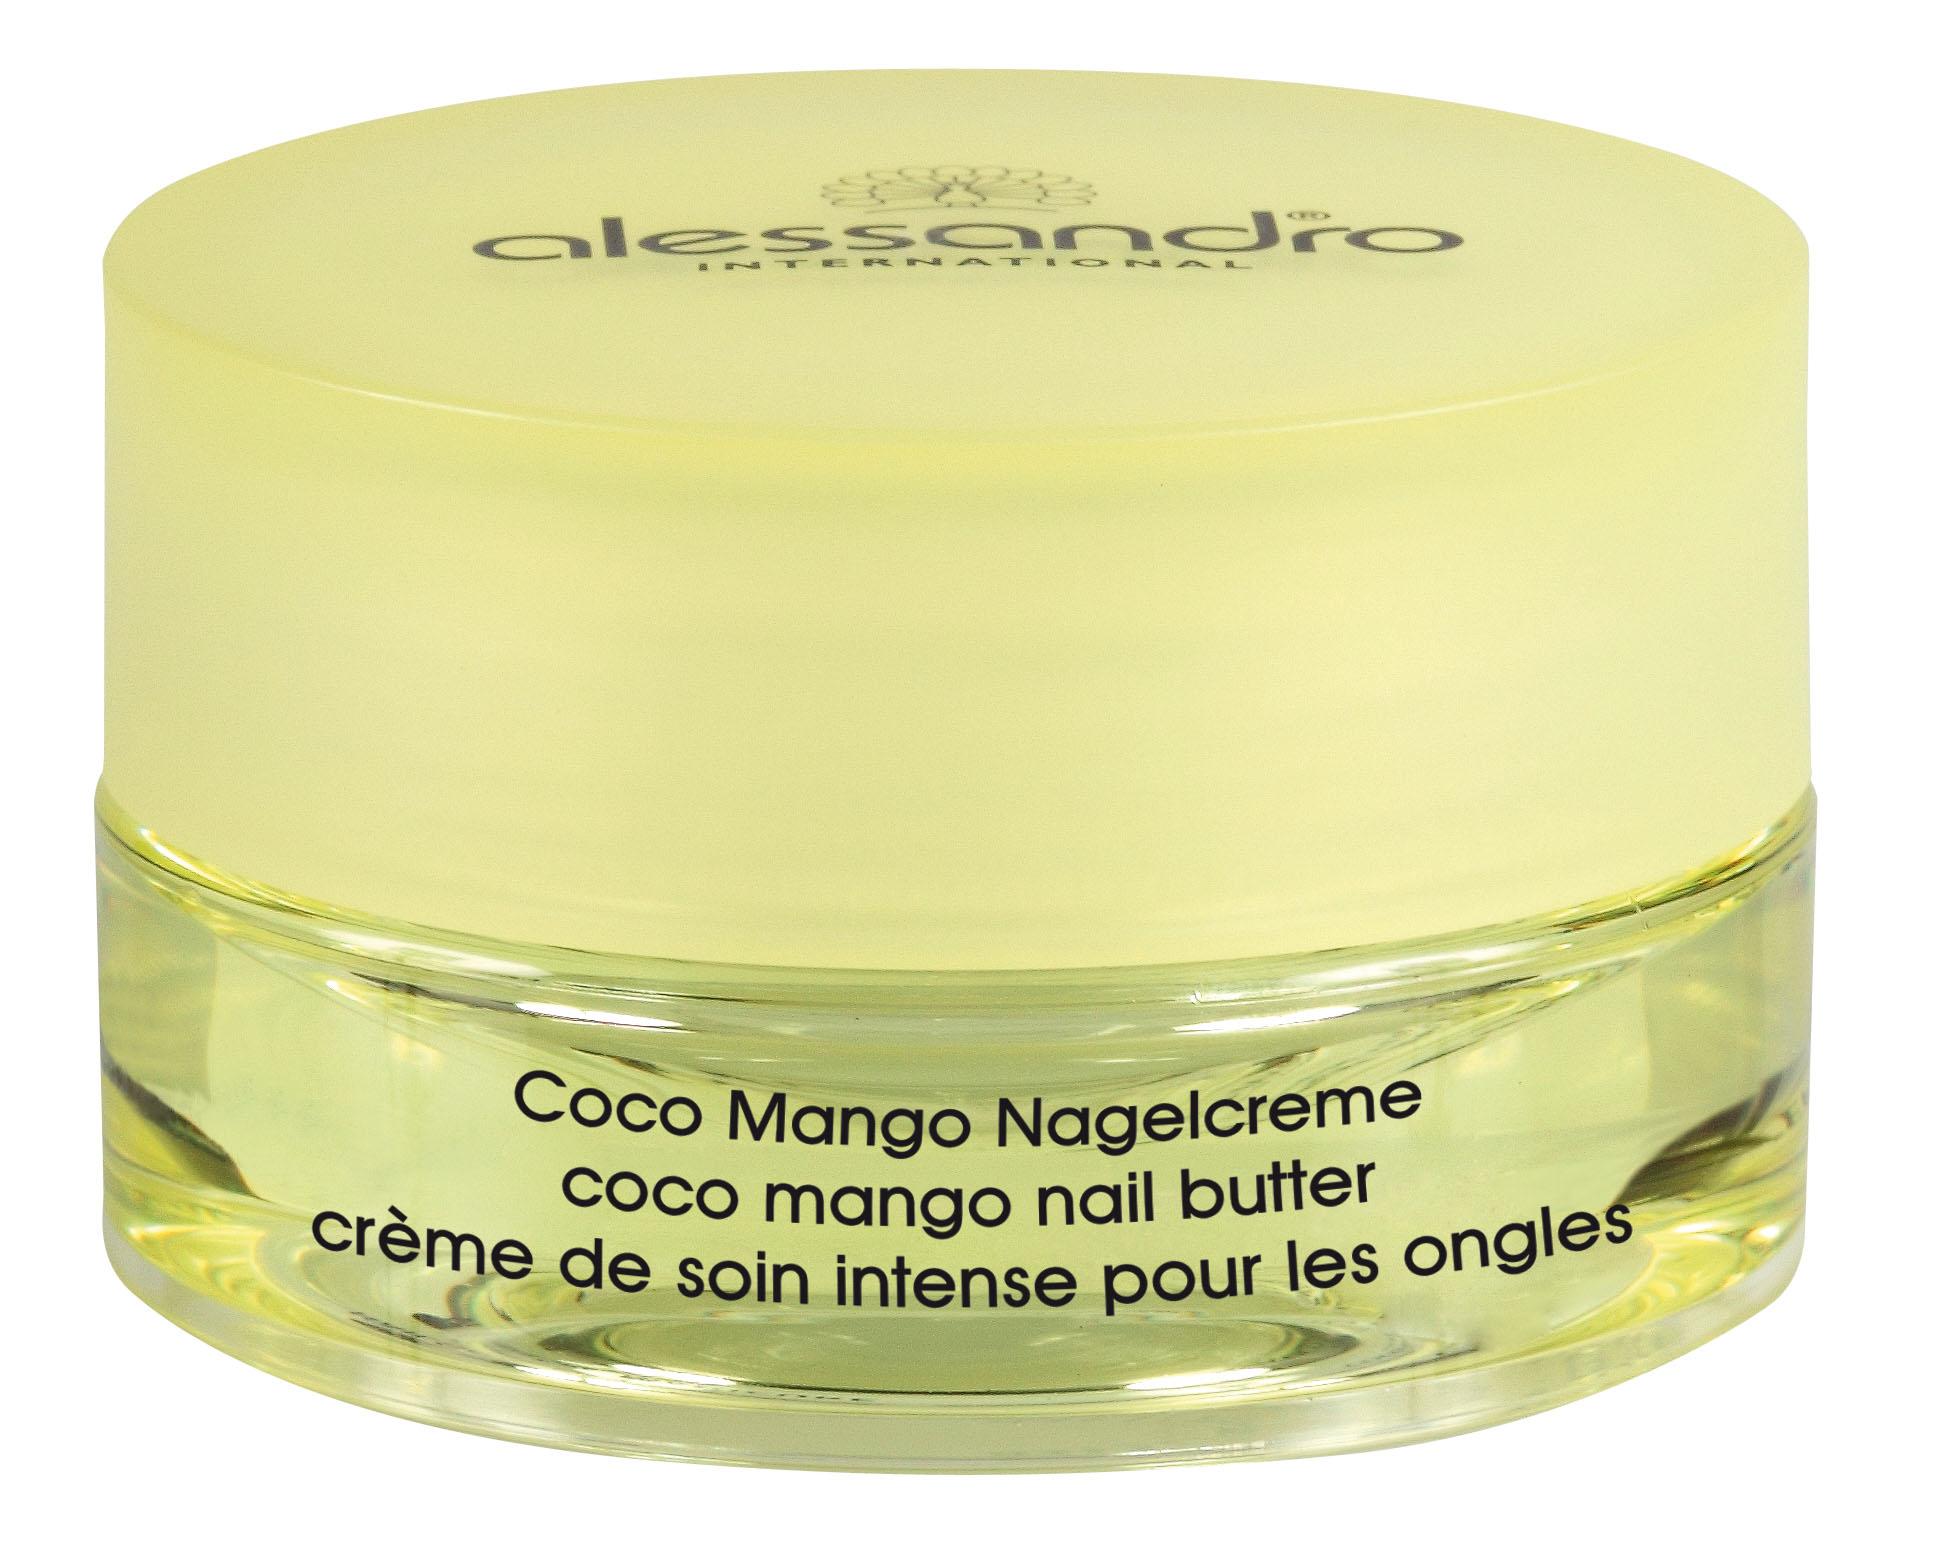 Nail Spa Coco Mango Nagelcreme 100ml-139,33€